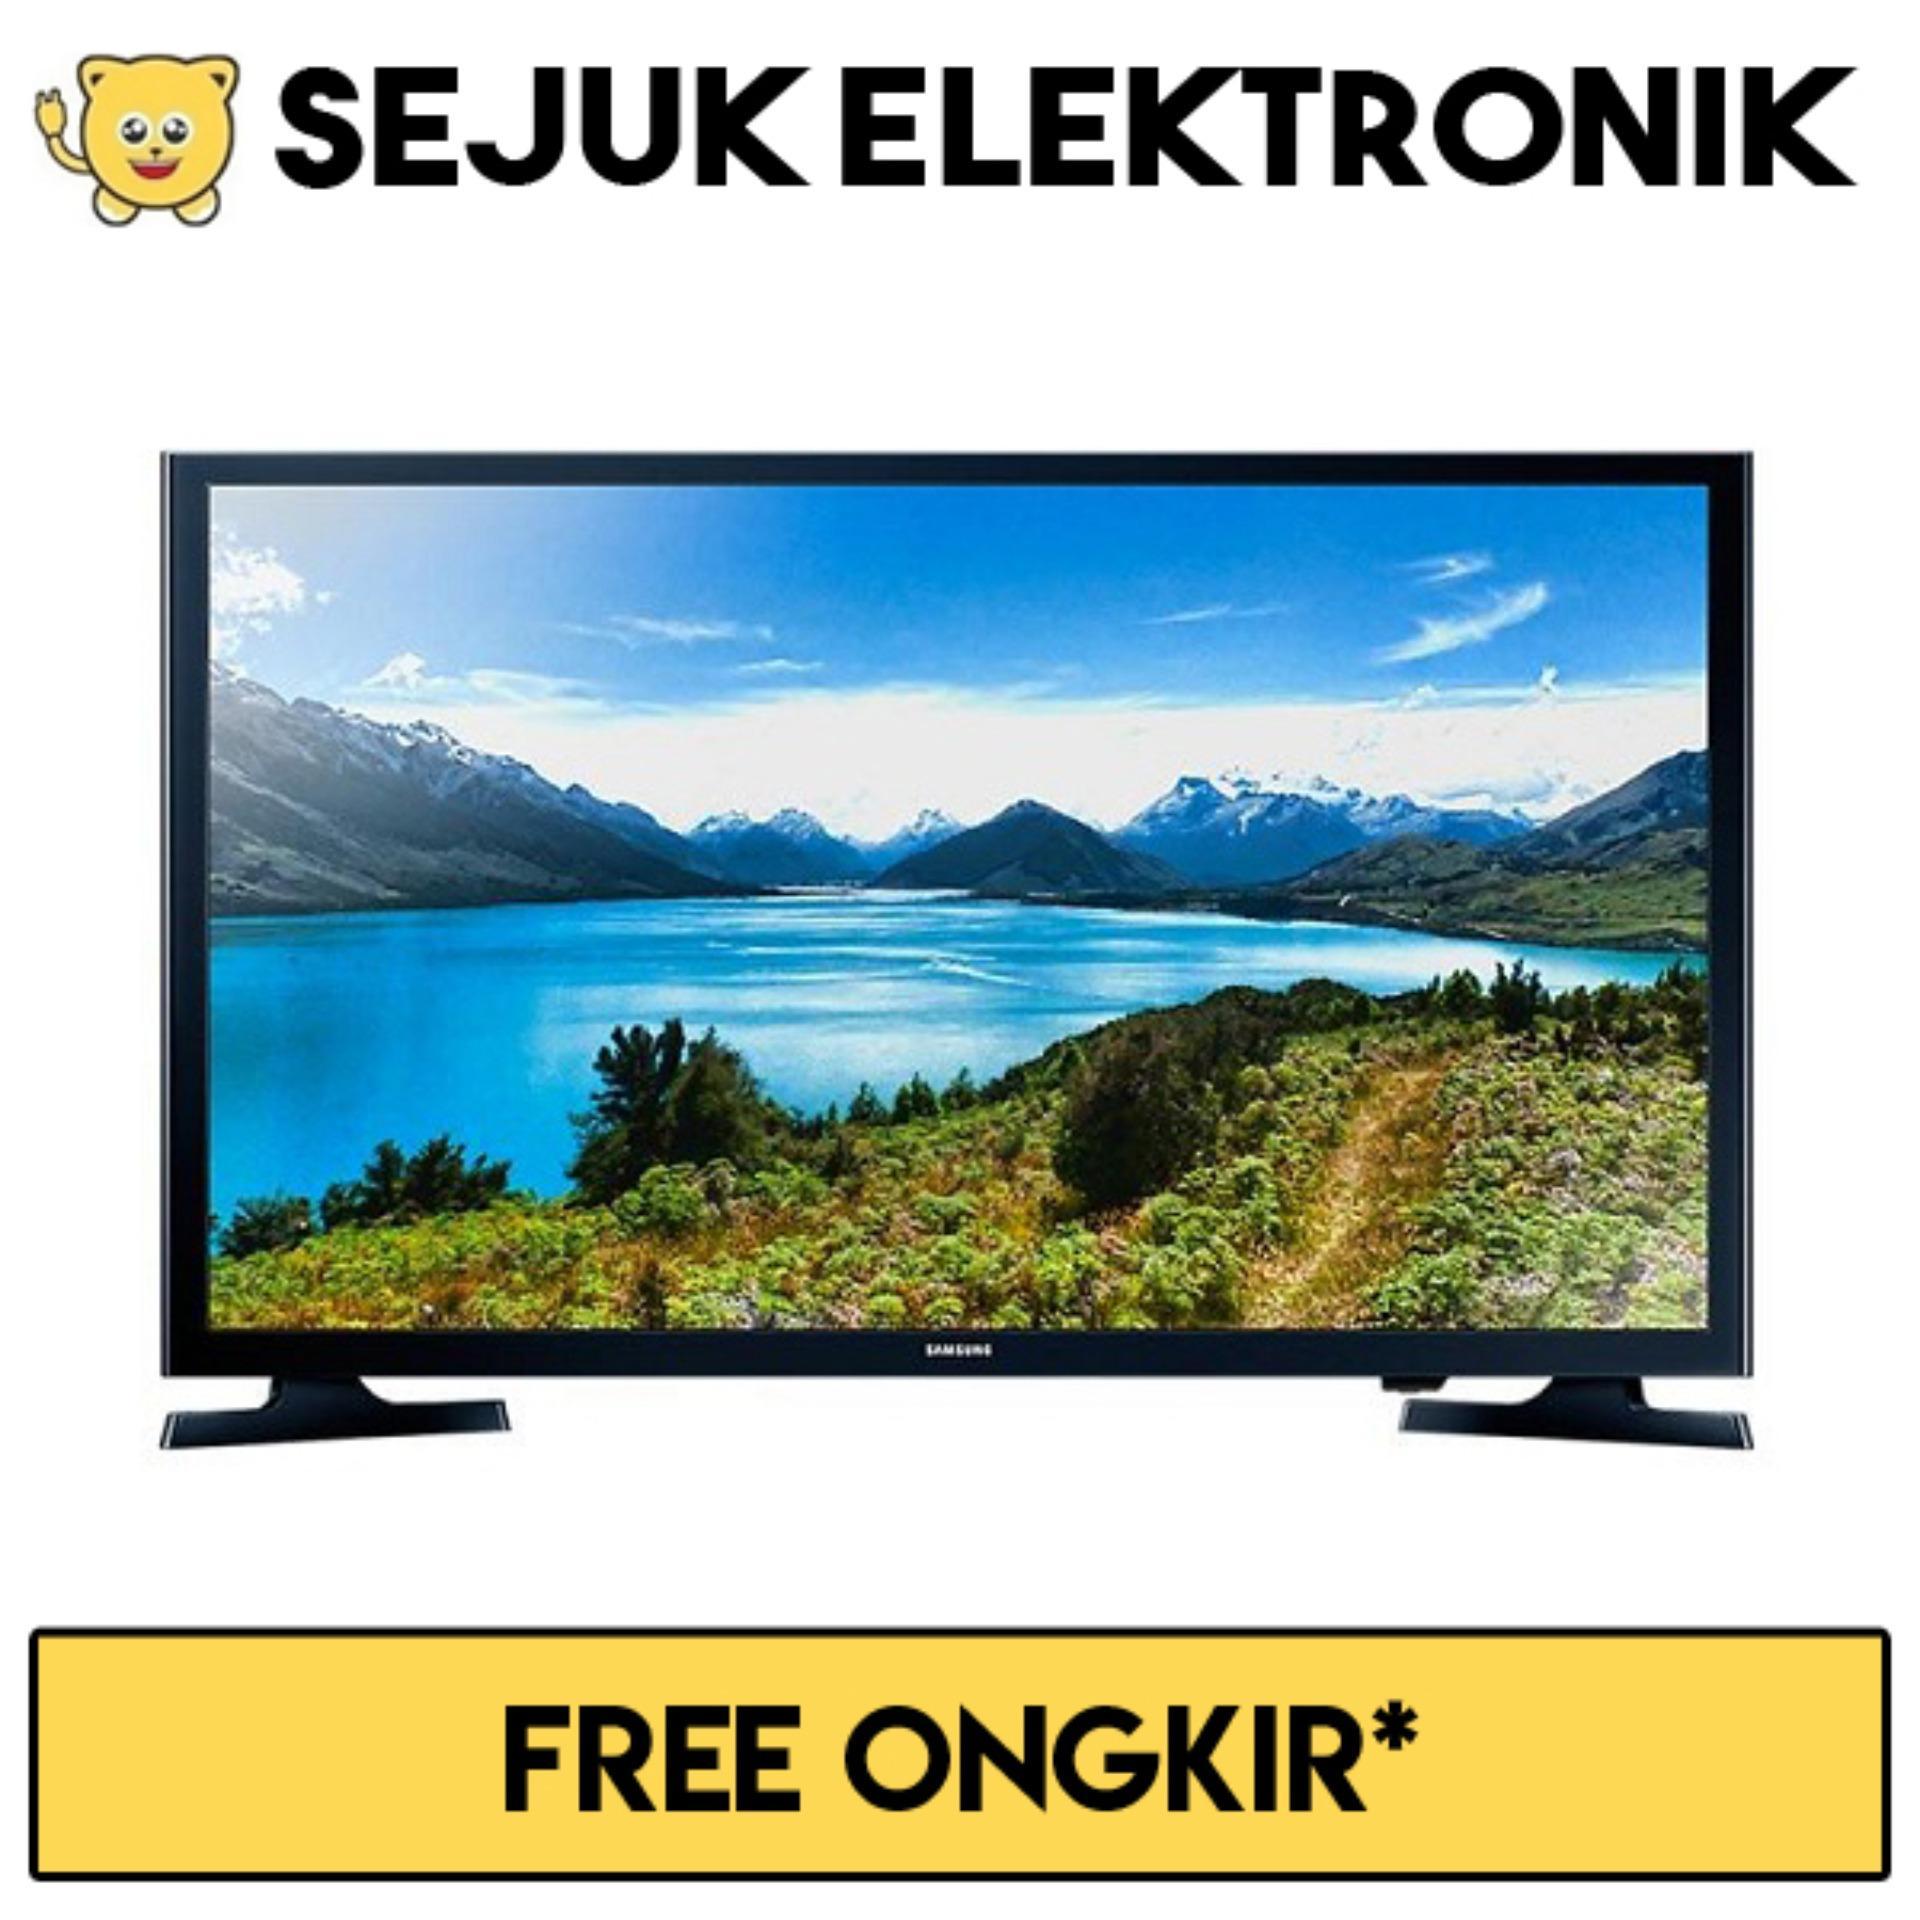 Samsung 32 LED TV UA32J4003 Hitam JAKARTA ONLY